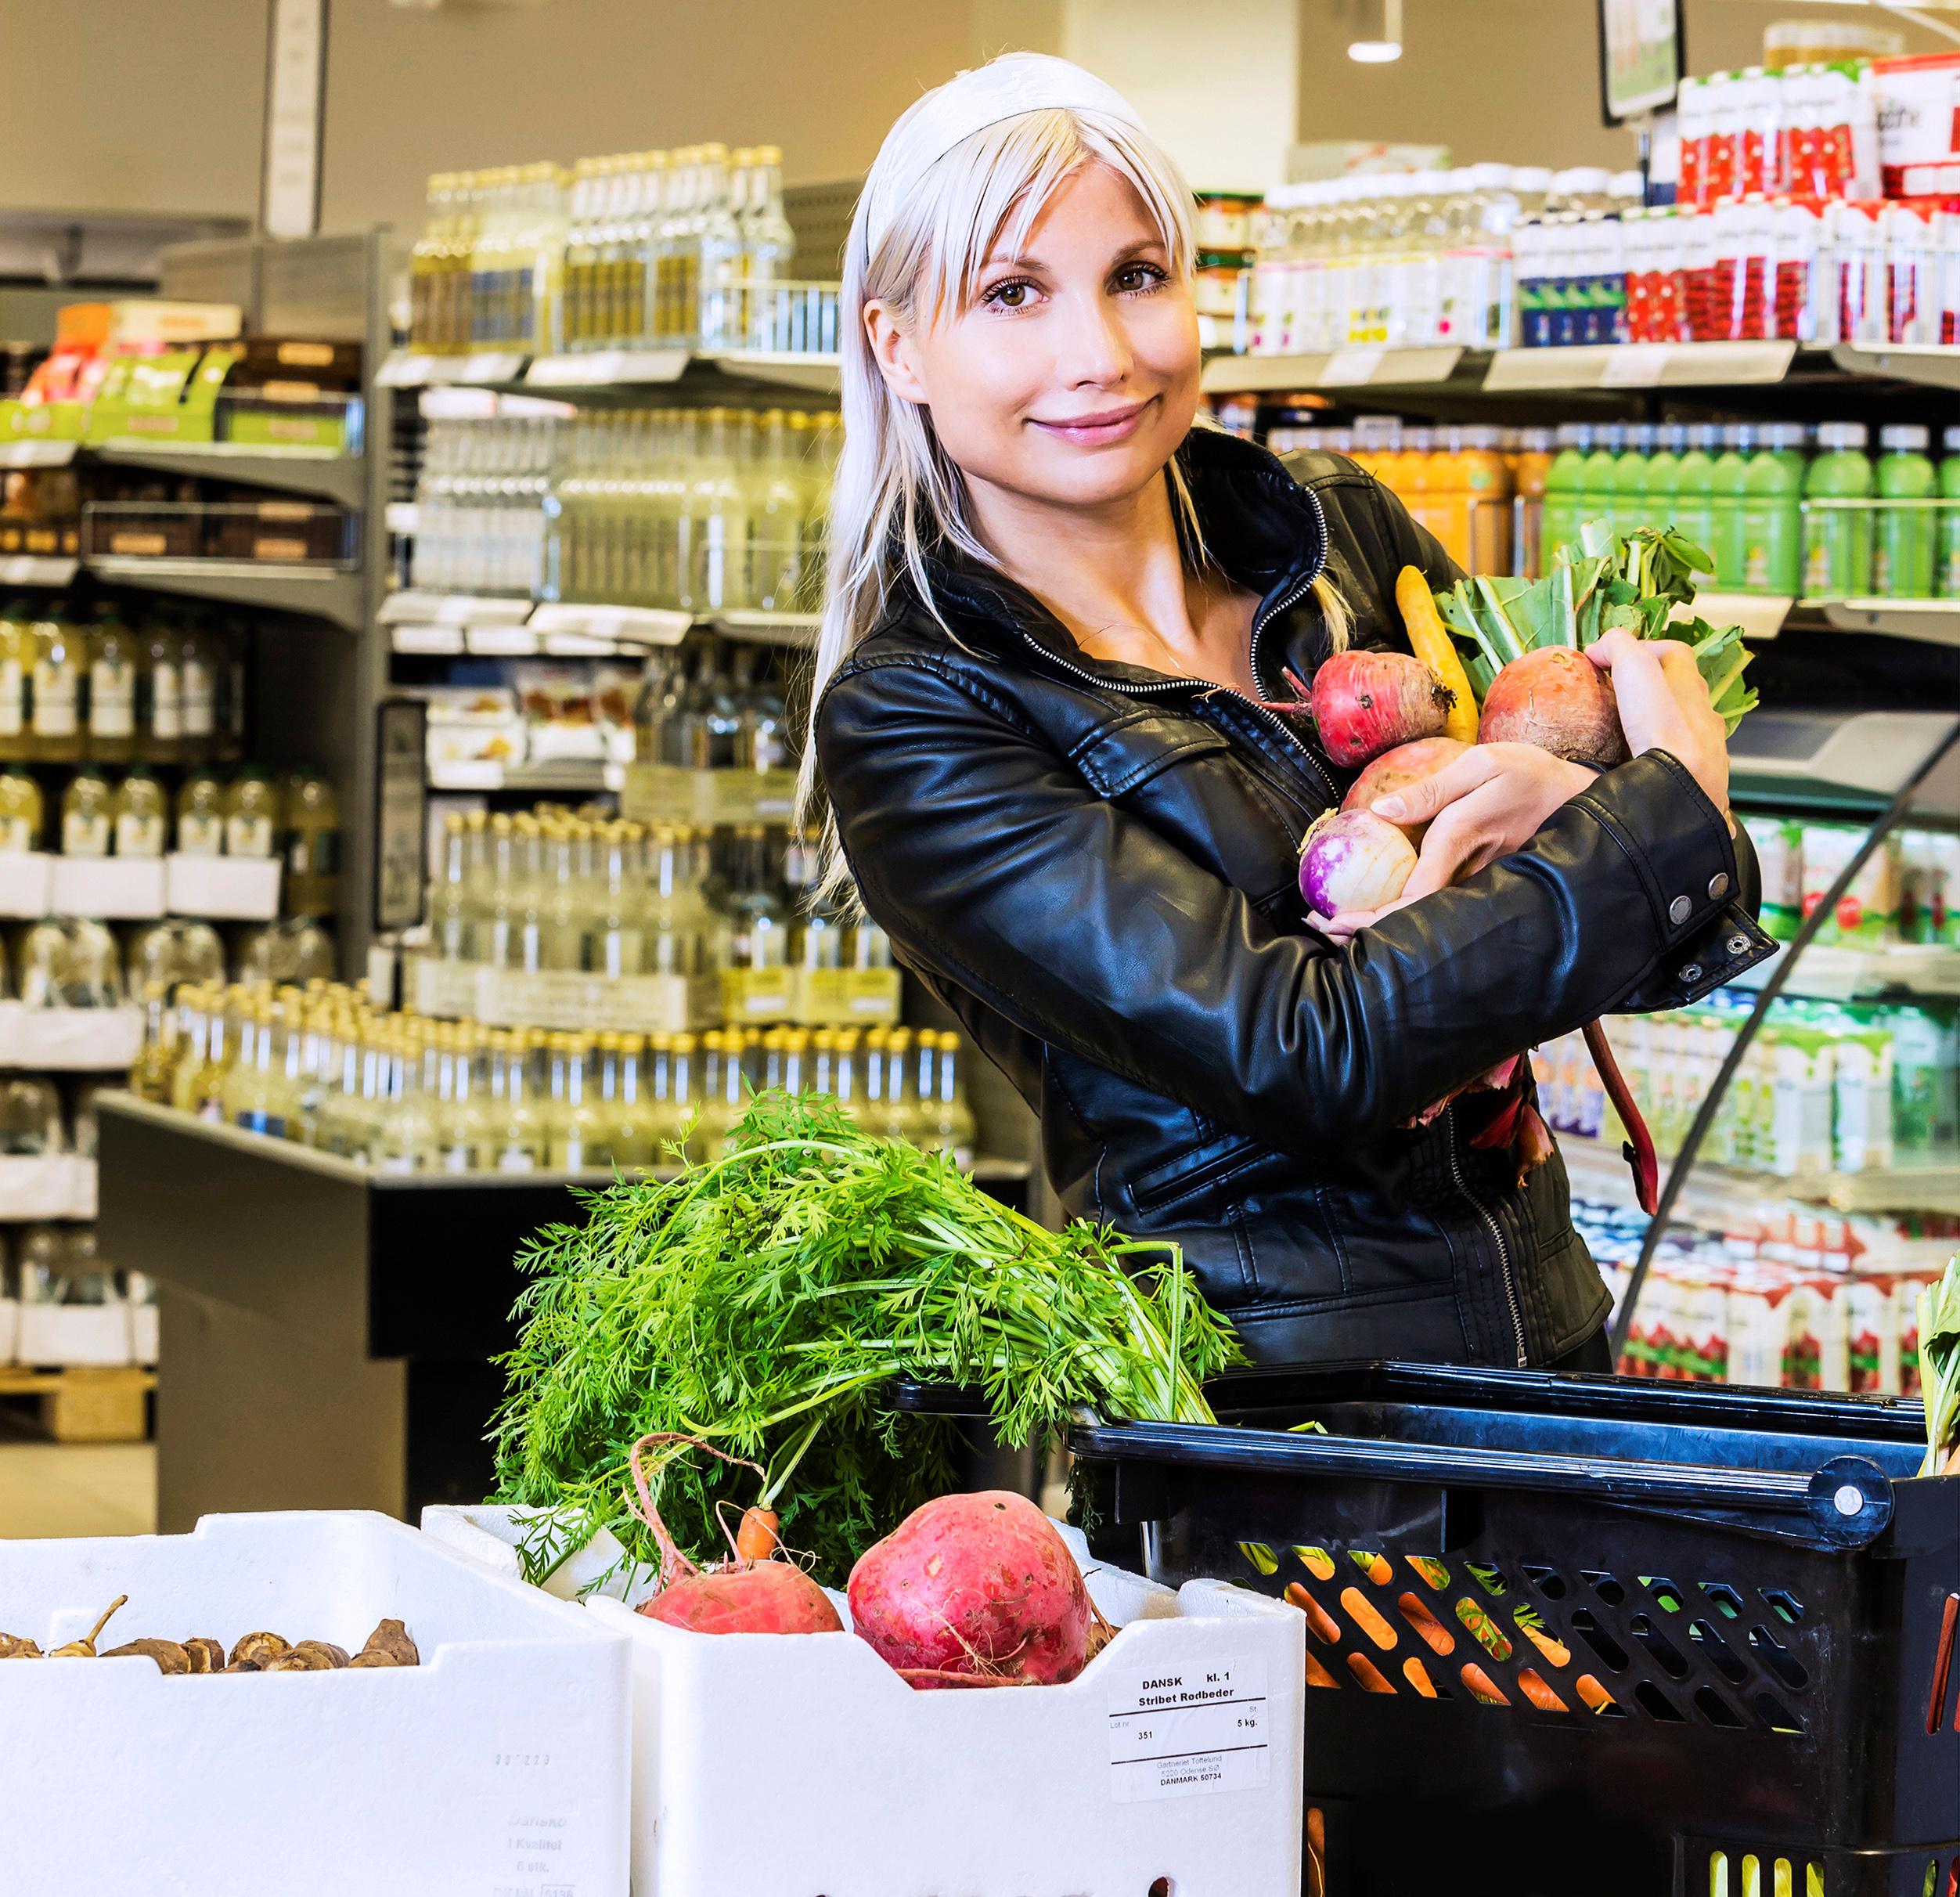 Selina Juul will keynote Greenbuild Europe 2018